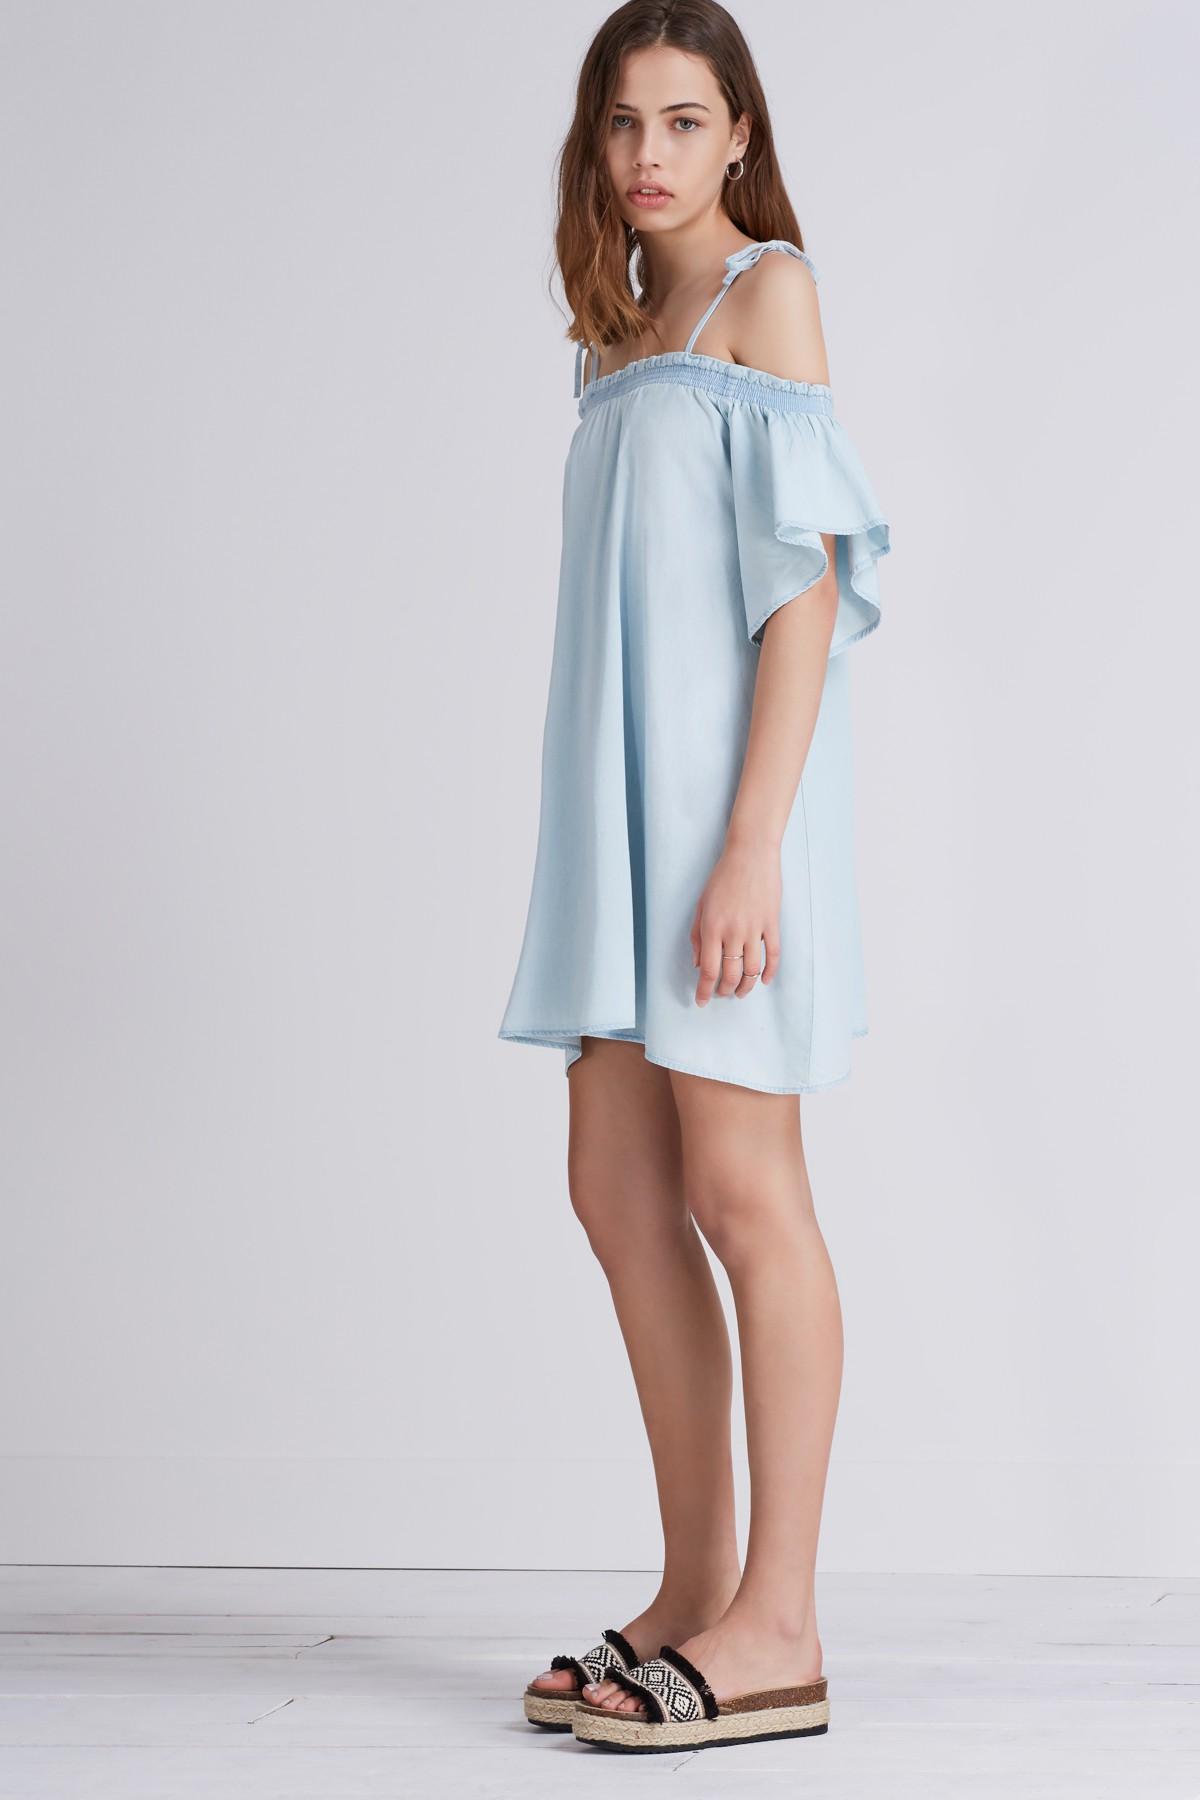 The Fifth Label Sahara Dress.